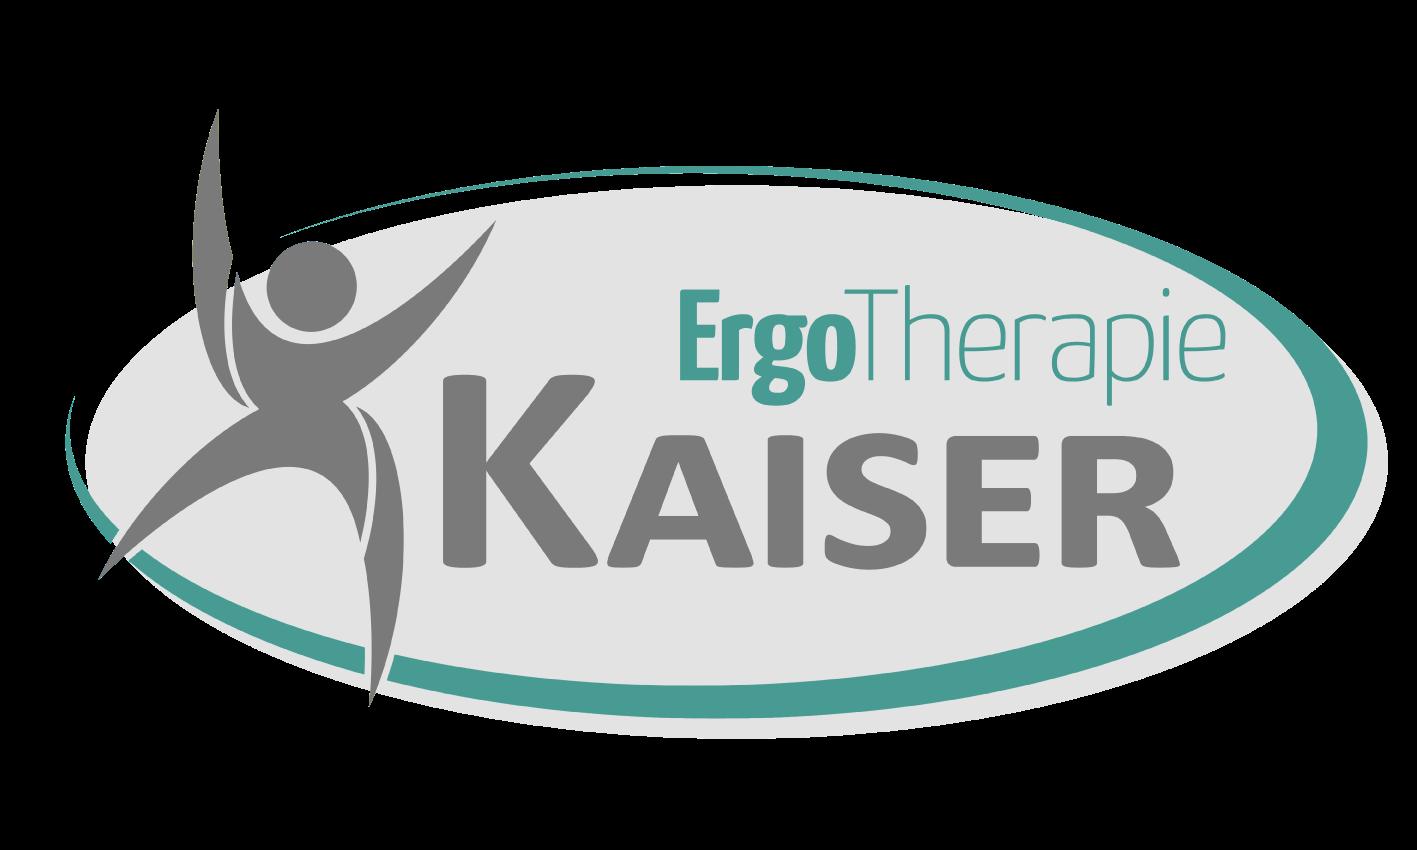 Ergotherapie Kaiser